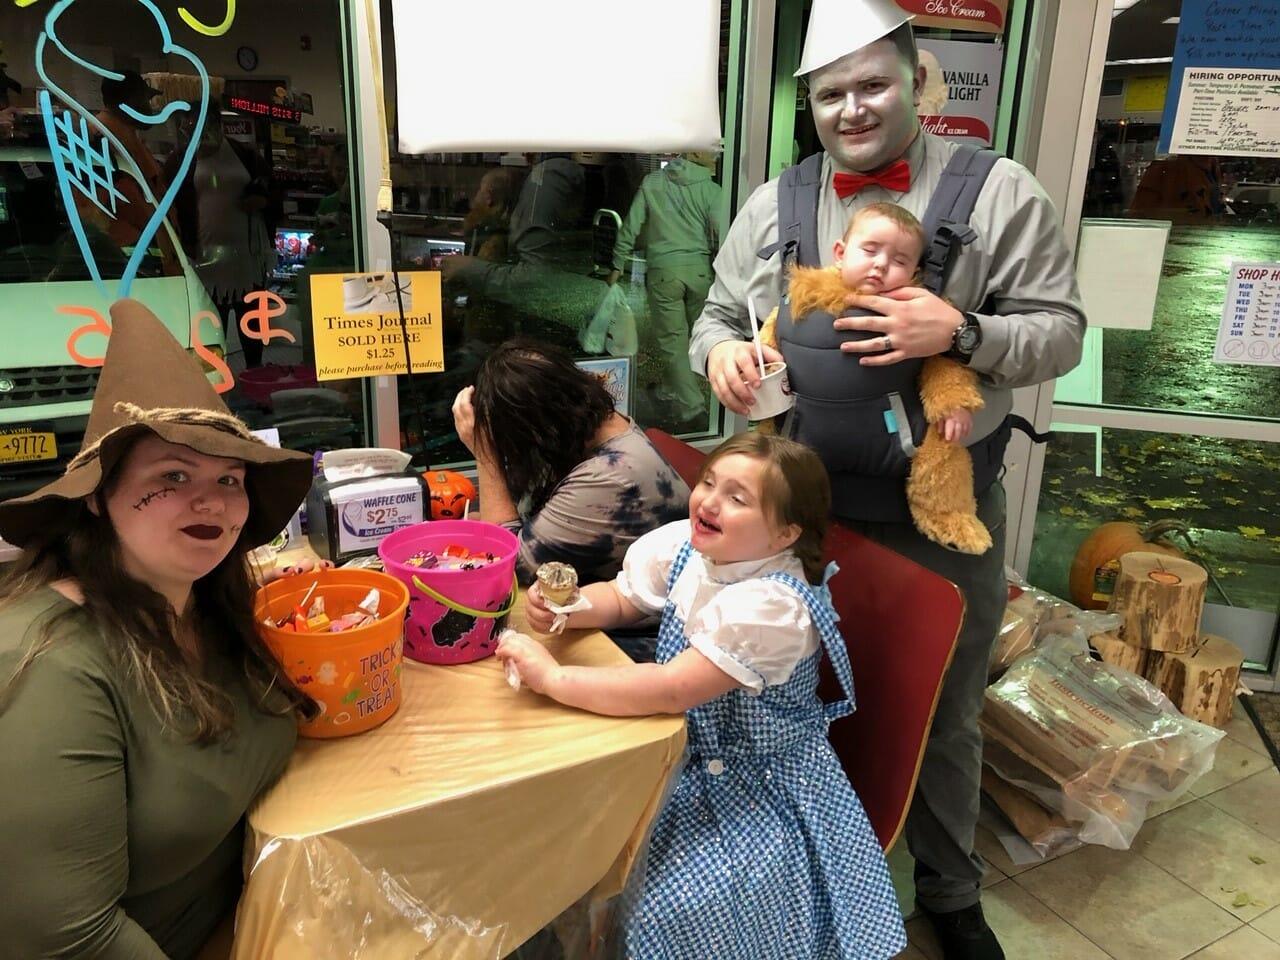 Wizard of Oz family